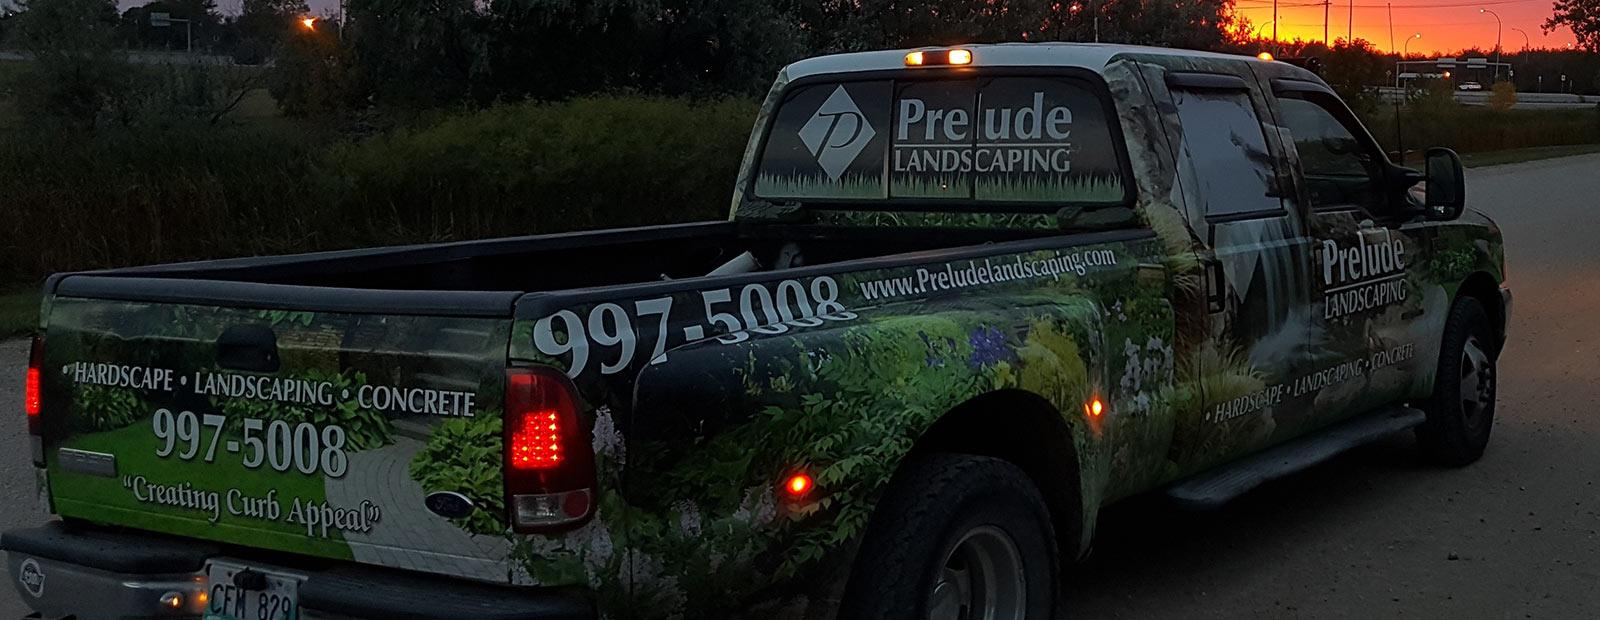 Winnipeg landscaping company